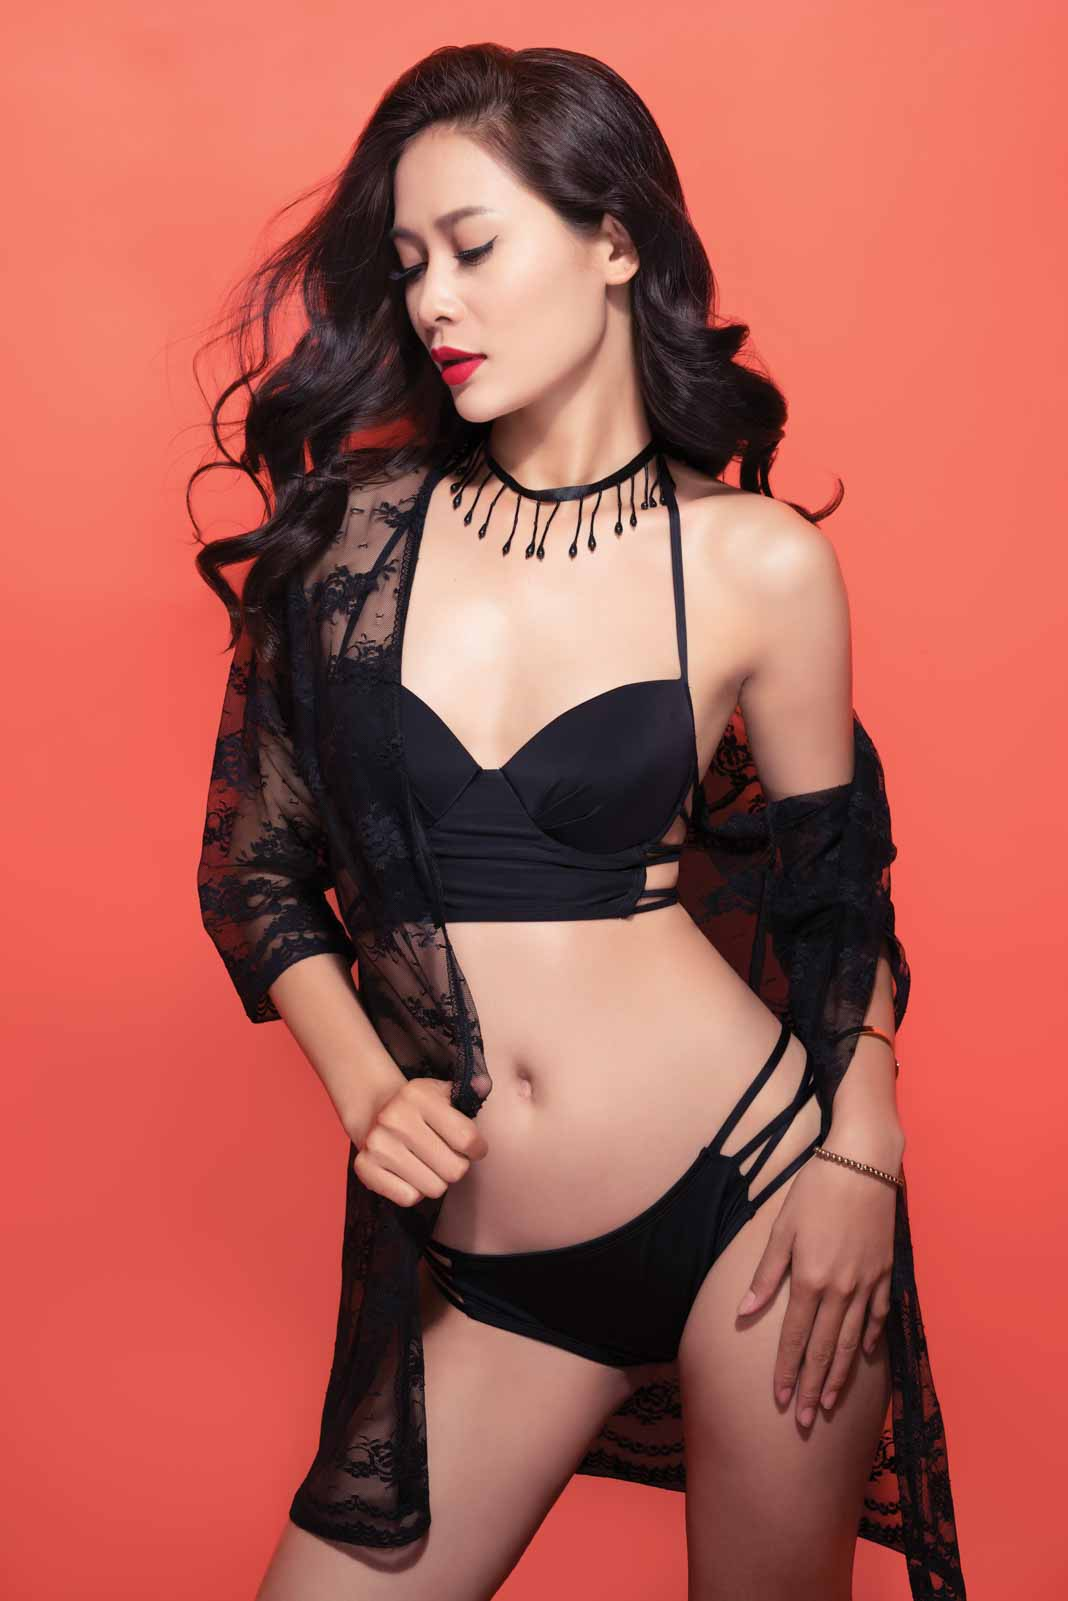 Bikini-cho-quy-co-ca-tinh-TT-657-2016-1